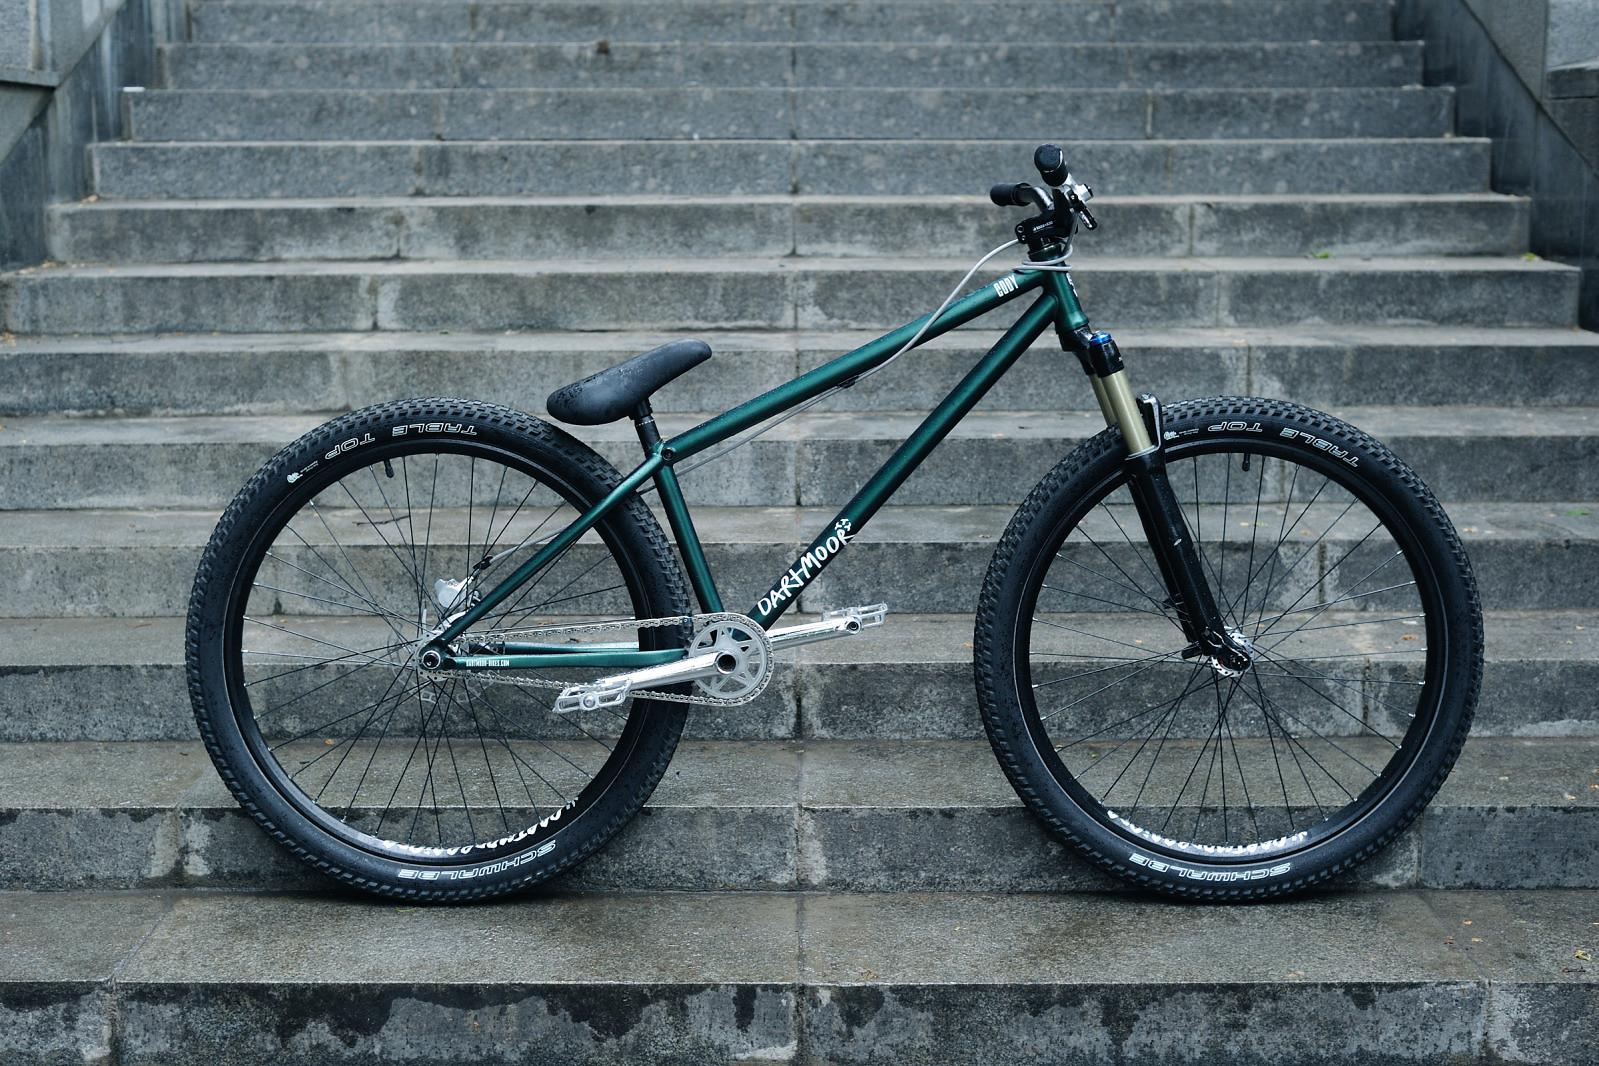 Cody II set- up - Dartmoor Bikes - Mountain Biking Pictures - Vital MTB